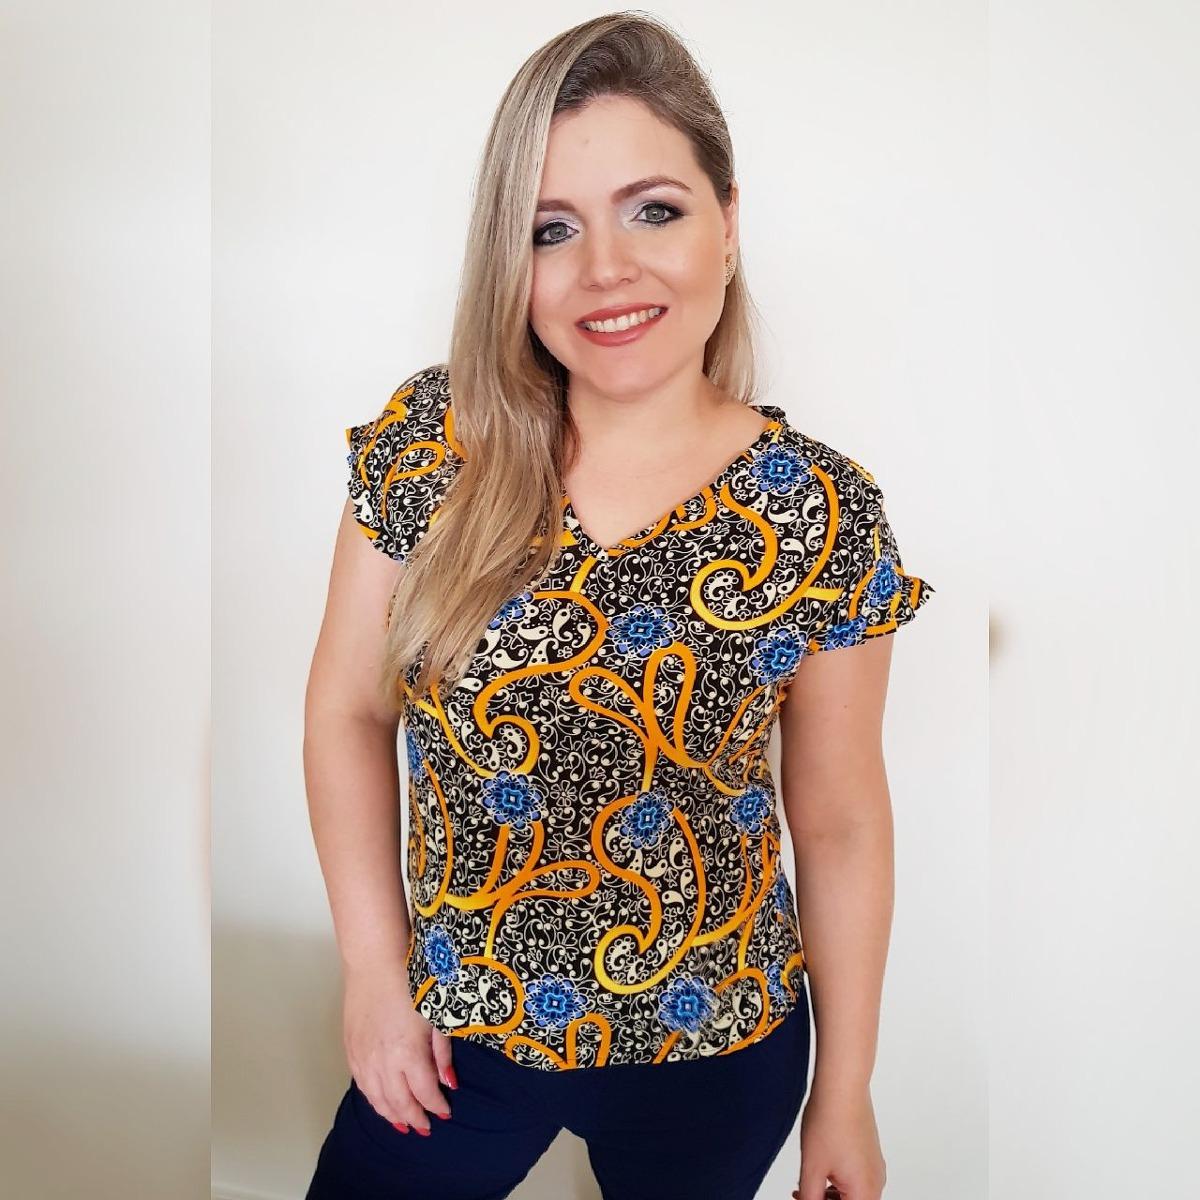 e32eef8ad1 blusinha viscose blusa de mangua curta moda feminina. Carregando zoom.